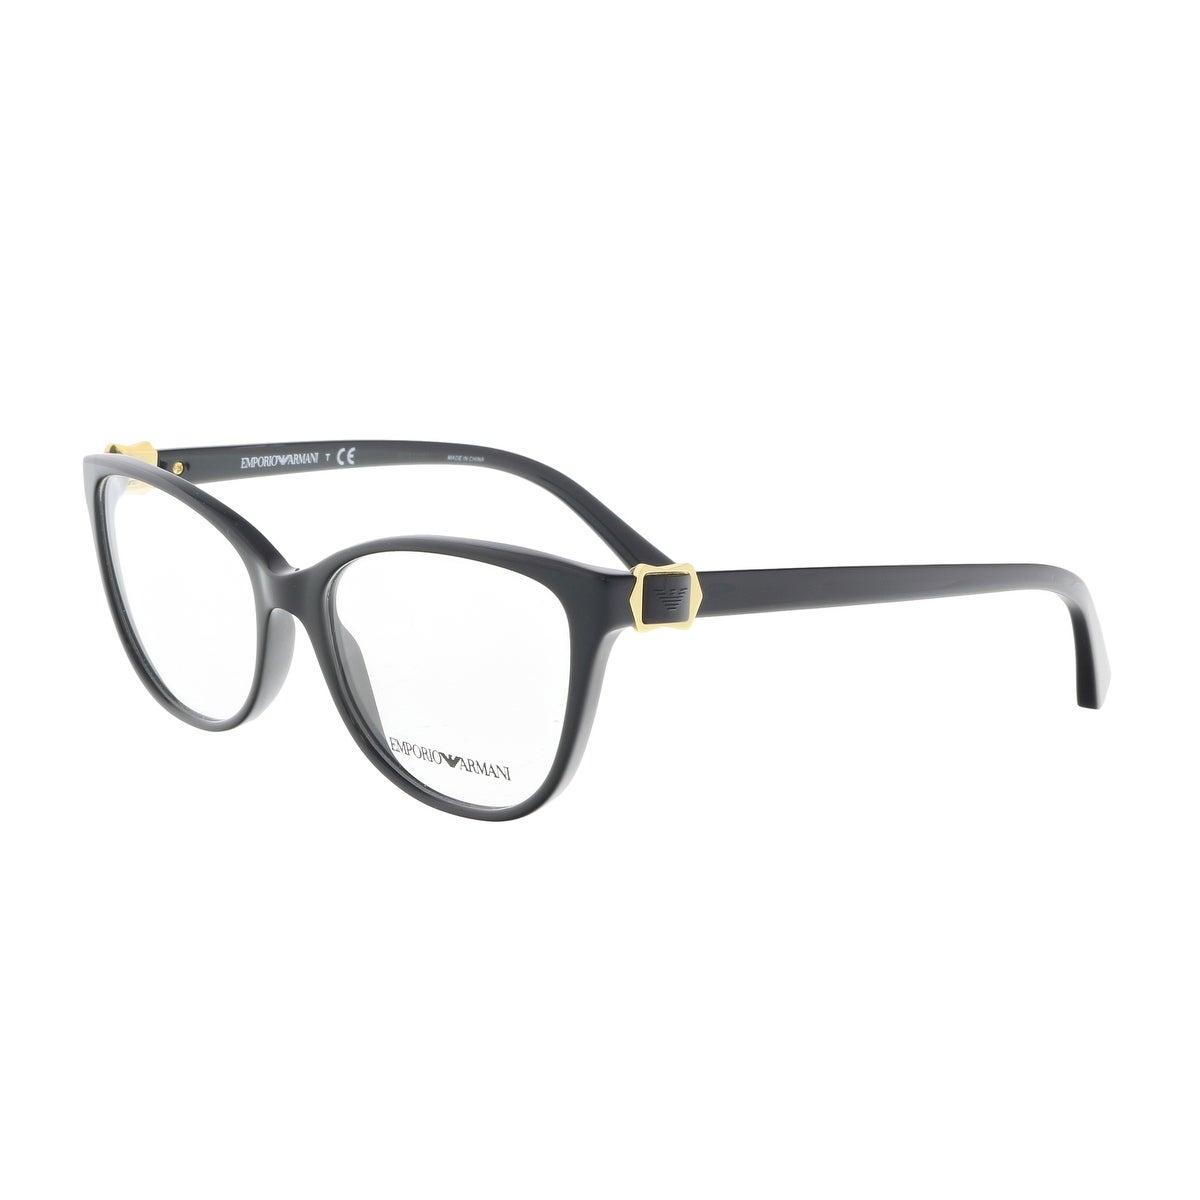 Shop Emporio Armani EA3077 5017 52 Black Round Optical Frames - 52 ...